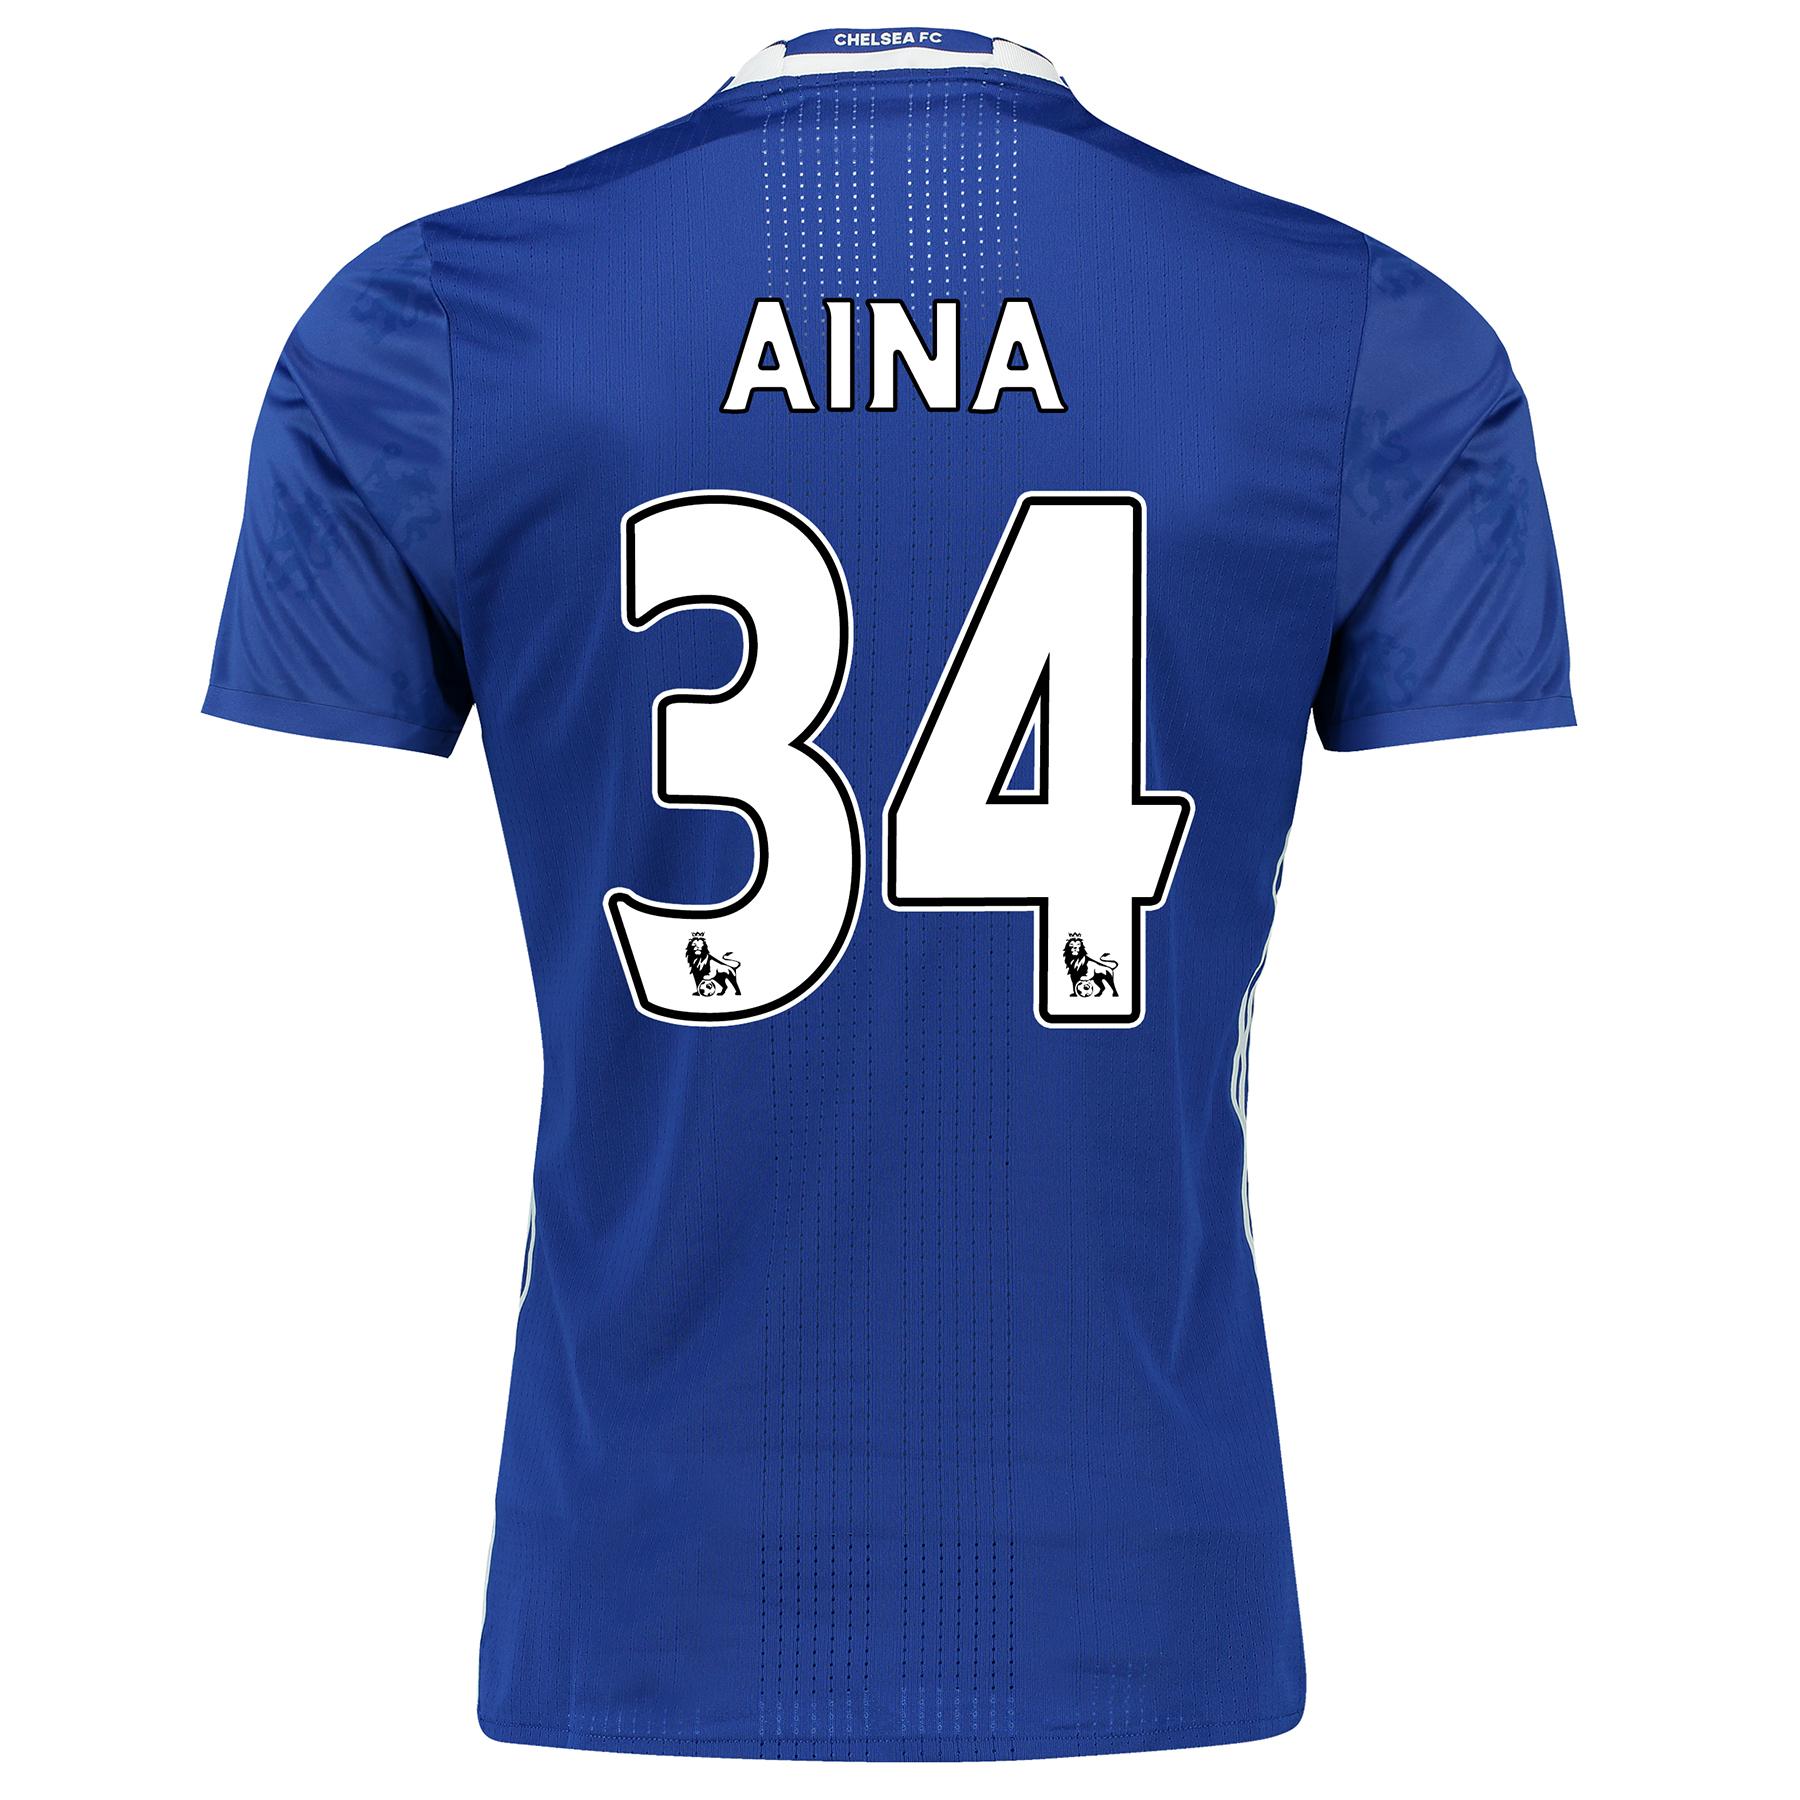 Chelsea Home Adi Zero Shirt 2016-17 with Aina 34 printing